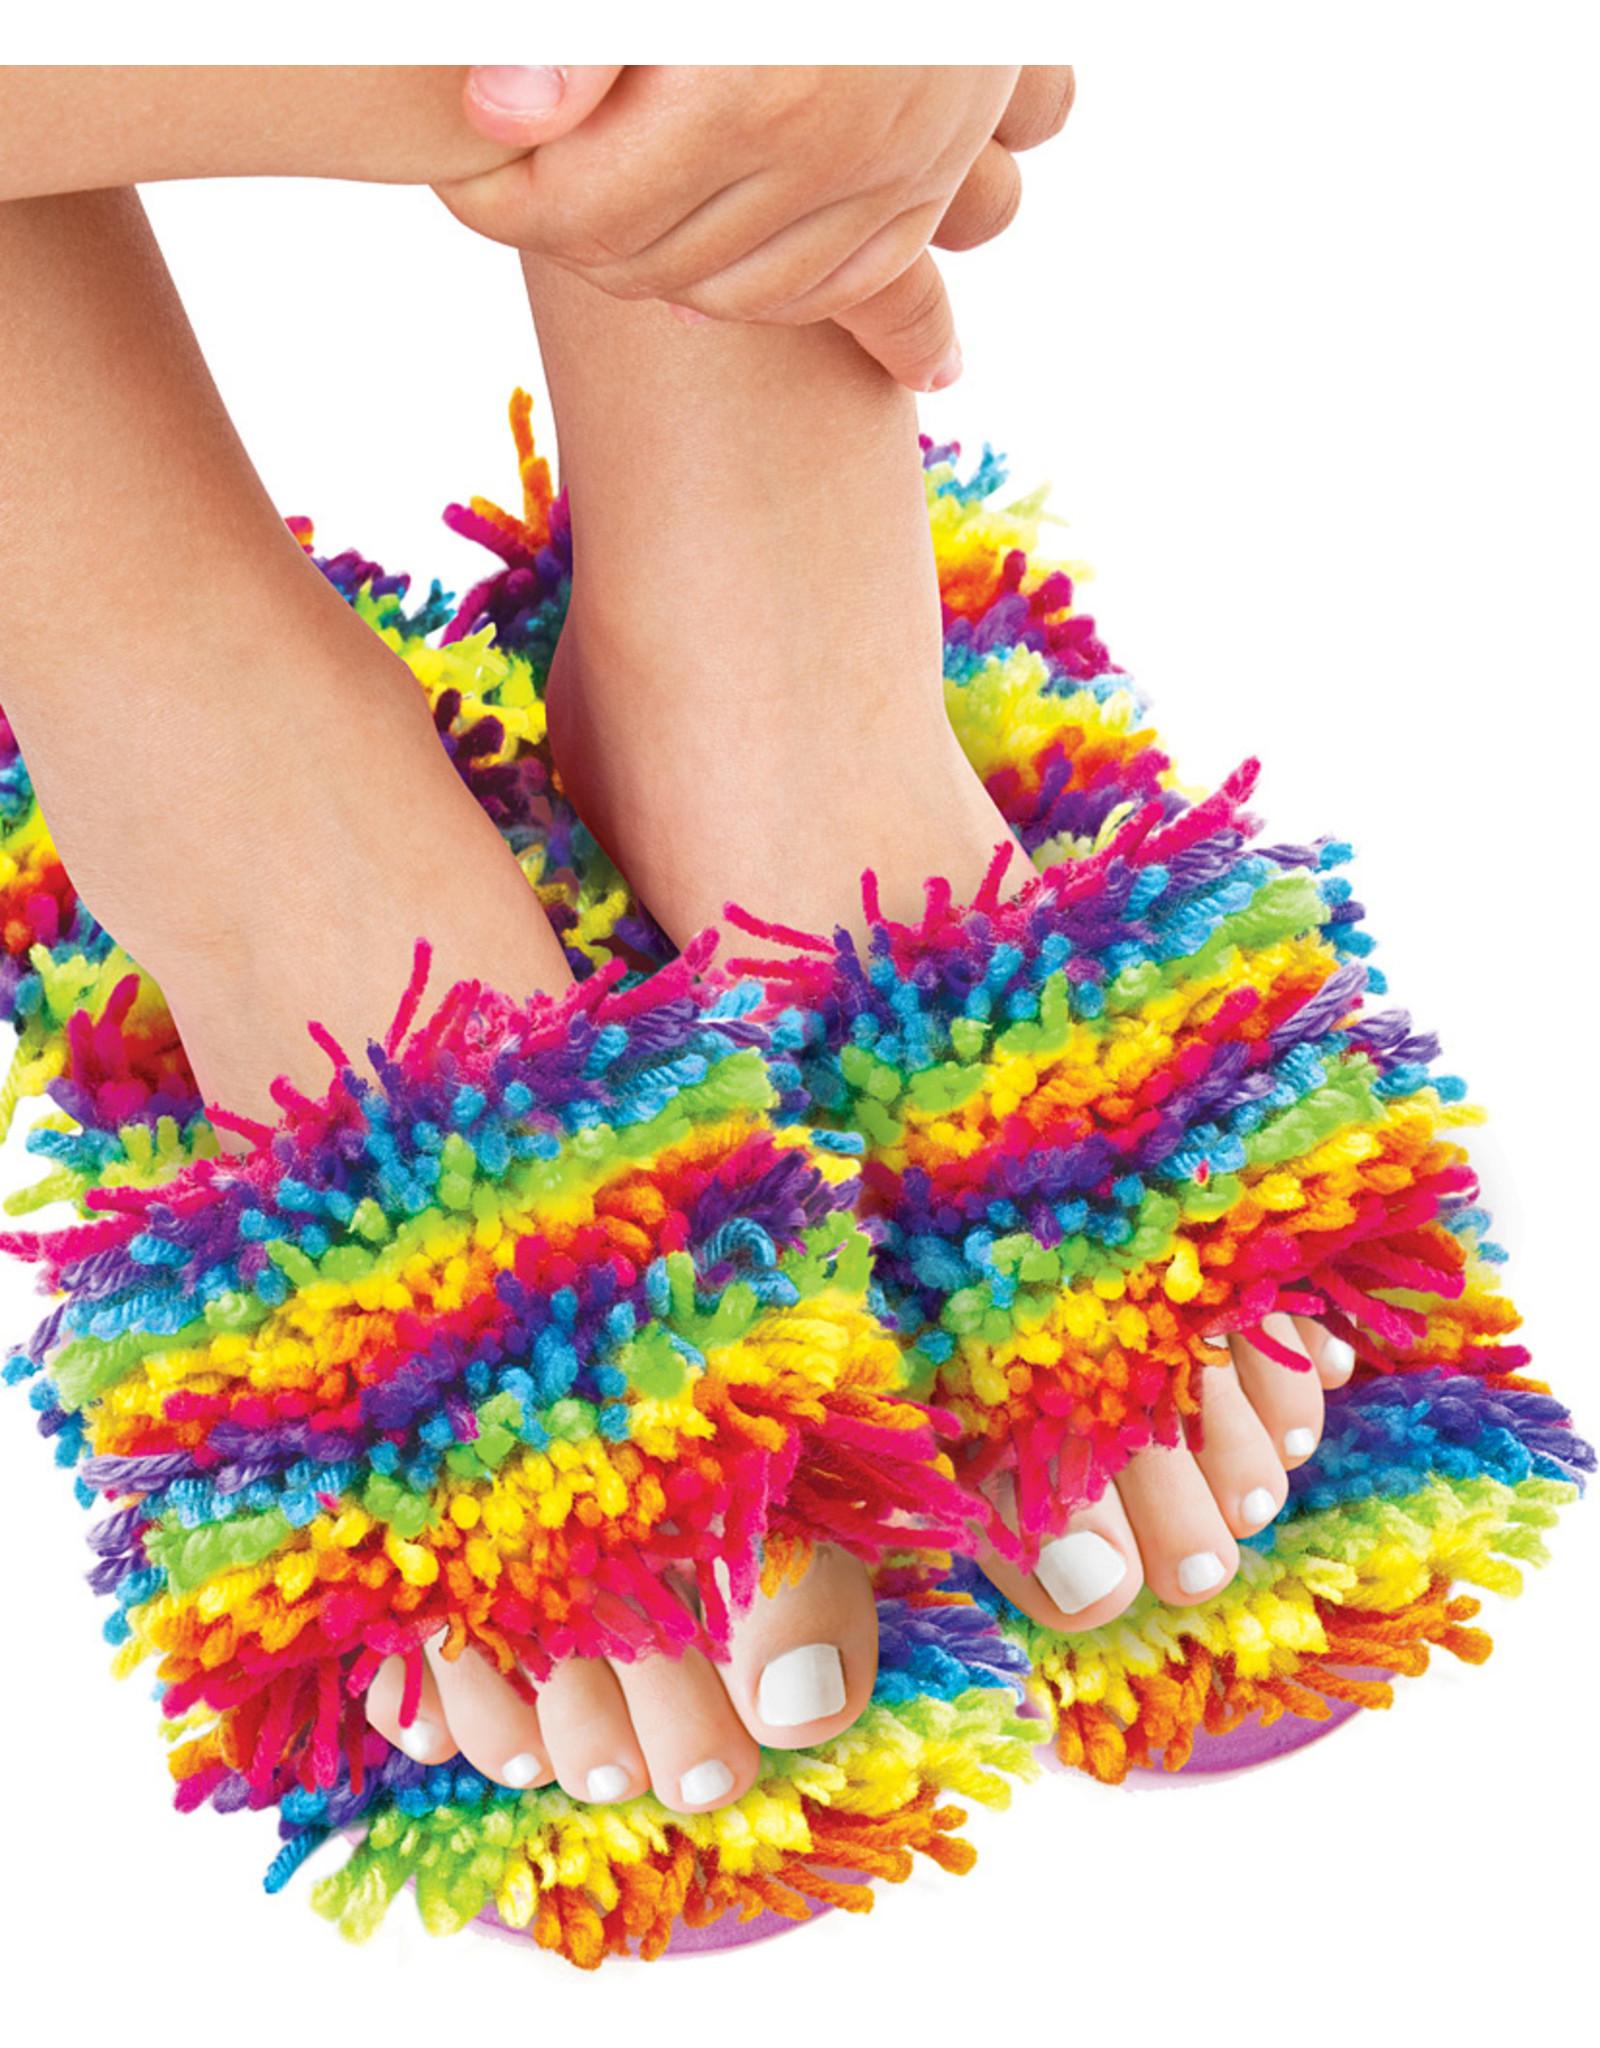 Fashion Angels Enterprises Shaggy Slippers Latch Hook Kit